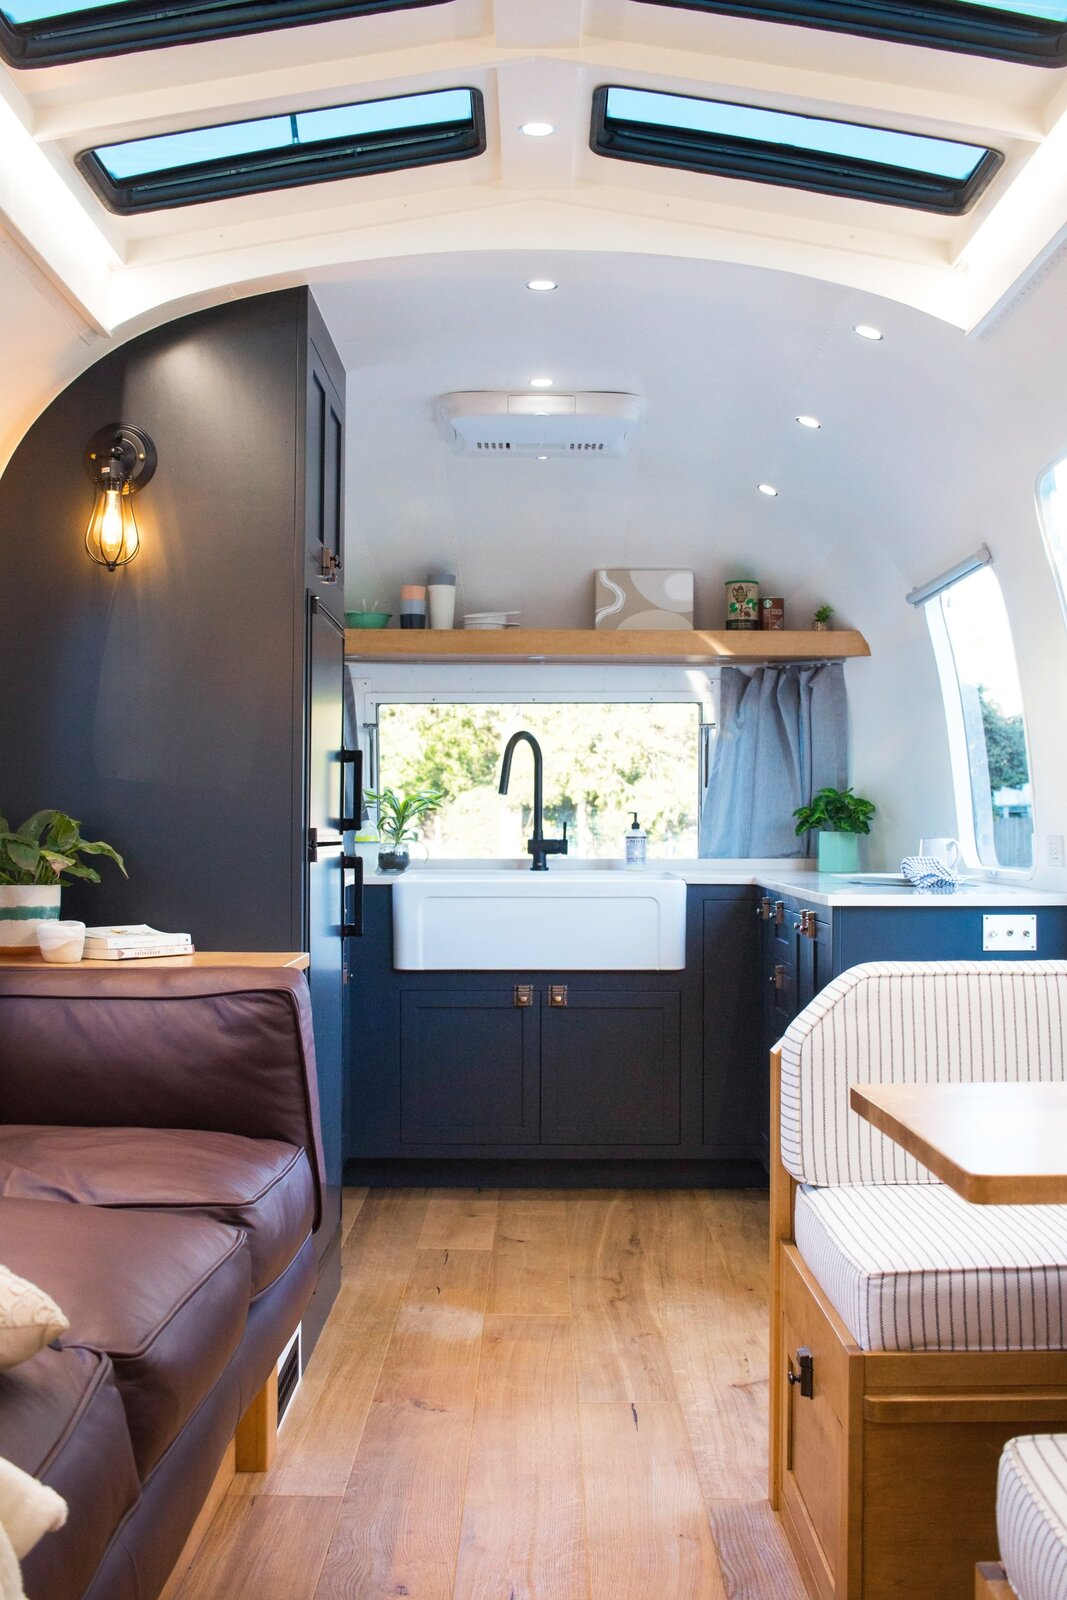 Driftwood Airstream kitchen